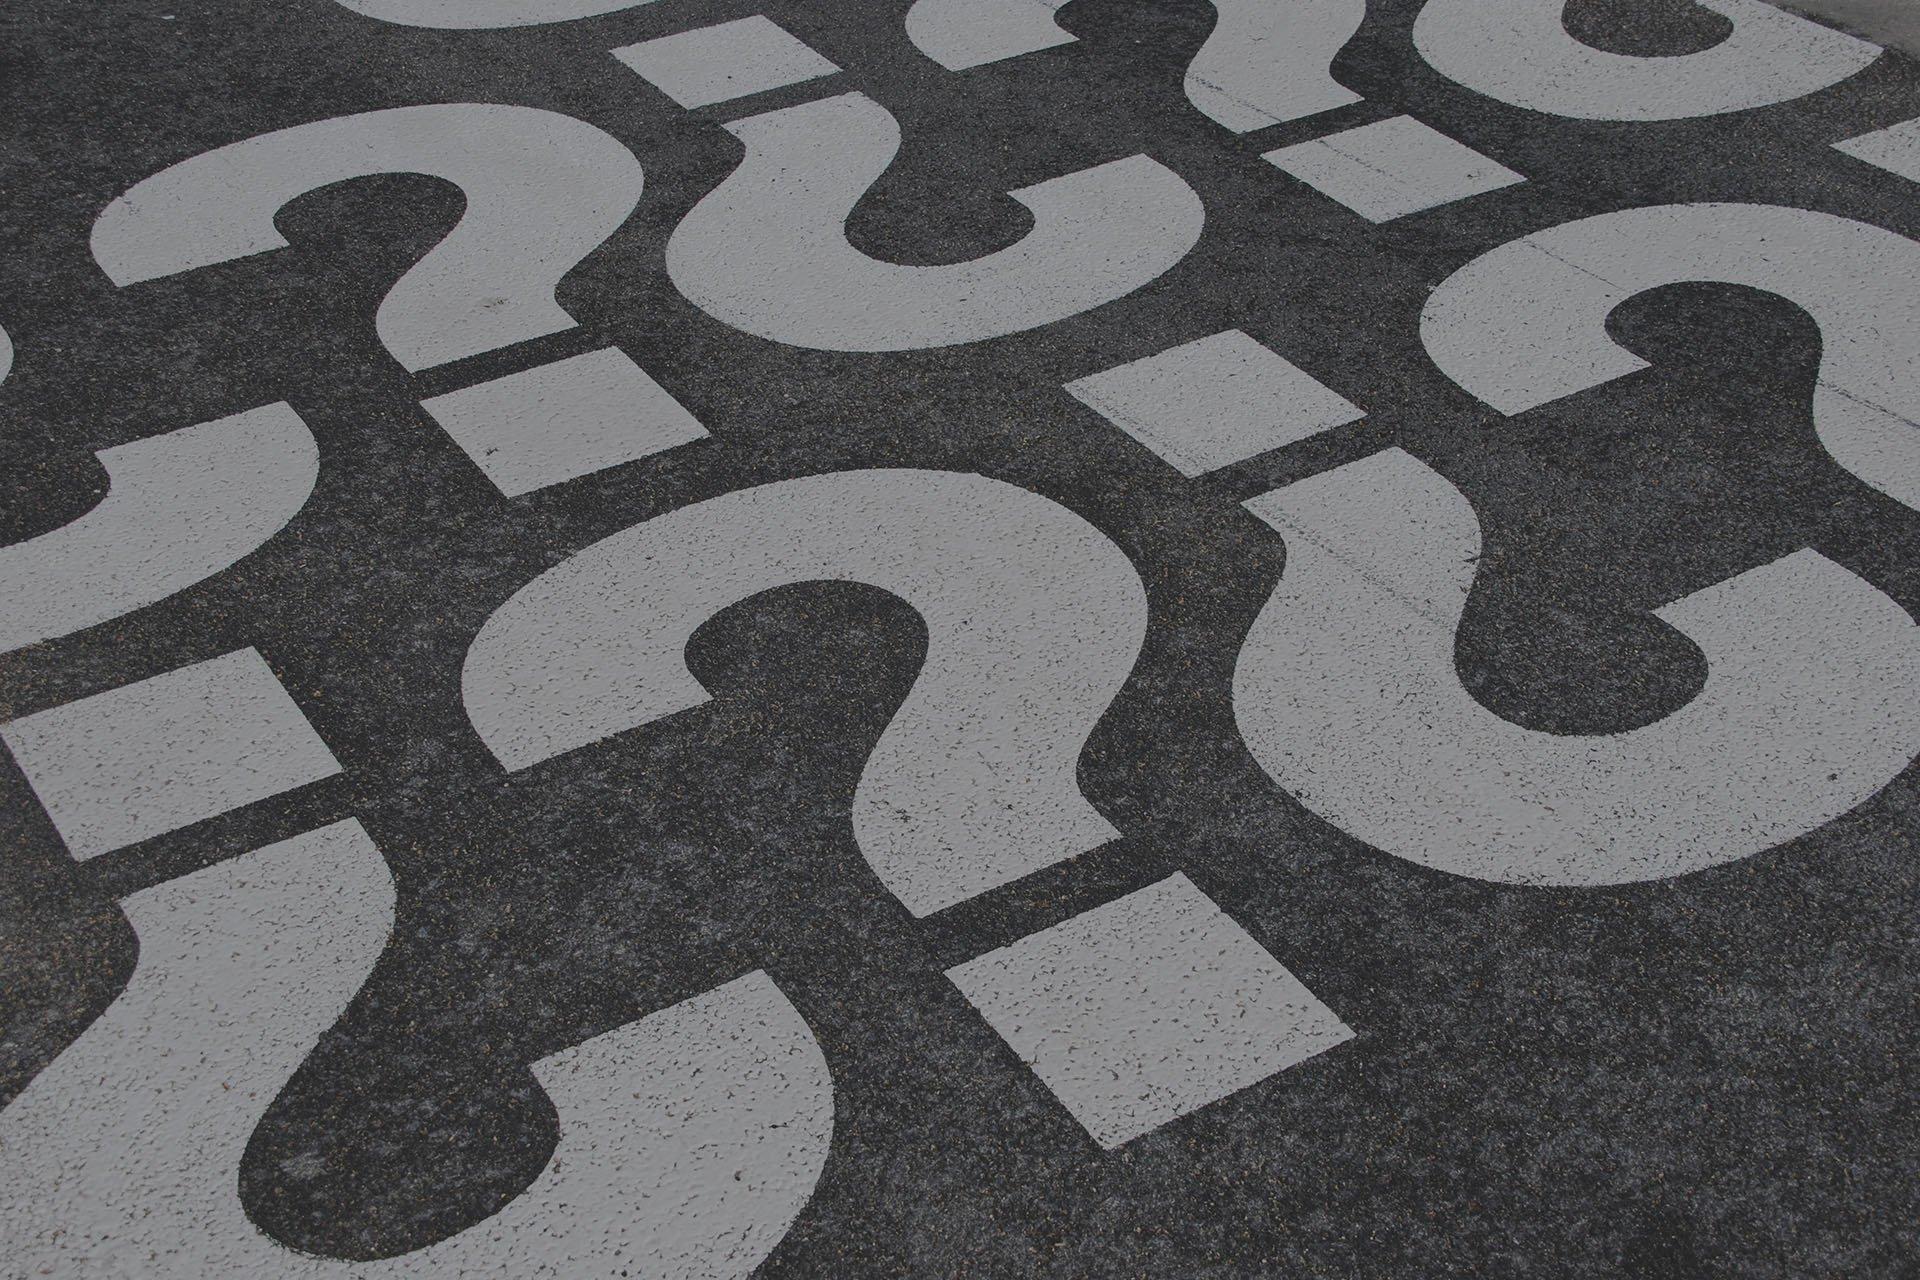 question-mark-sign_QJkoVV_web_dark